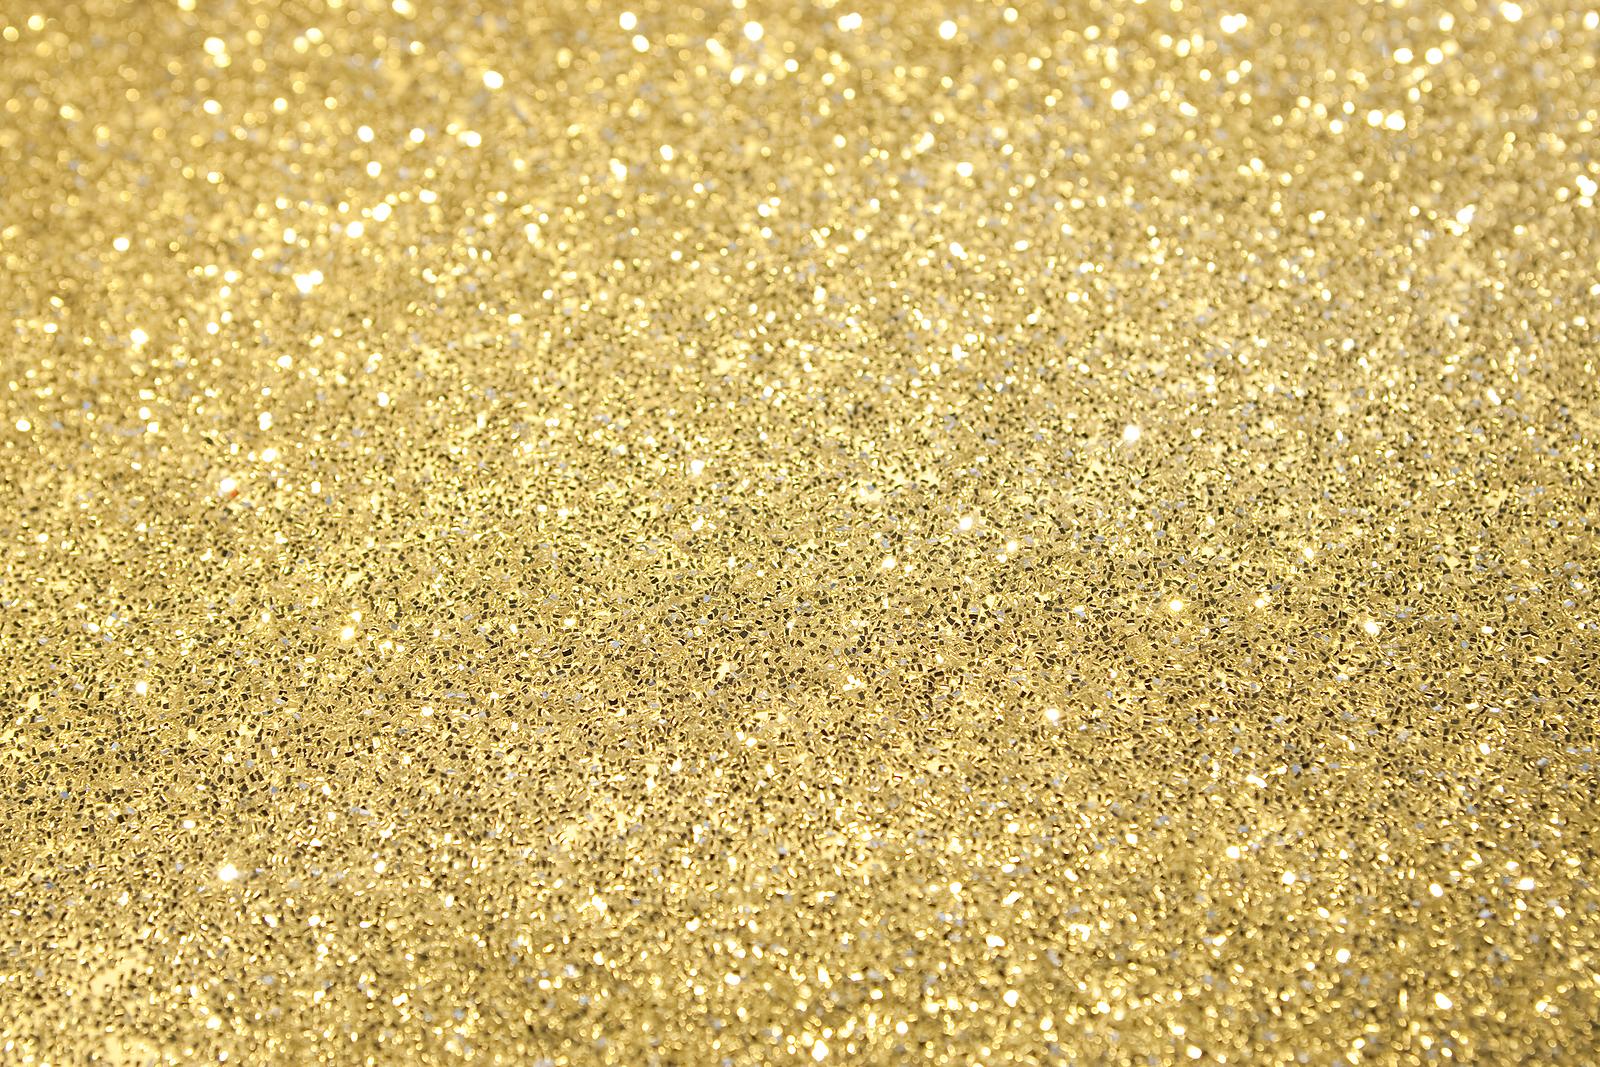 Sparkle Gold Wallpaper - WallpaperSafari